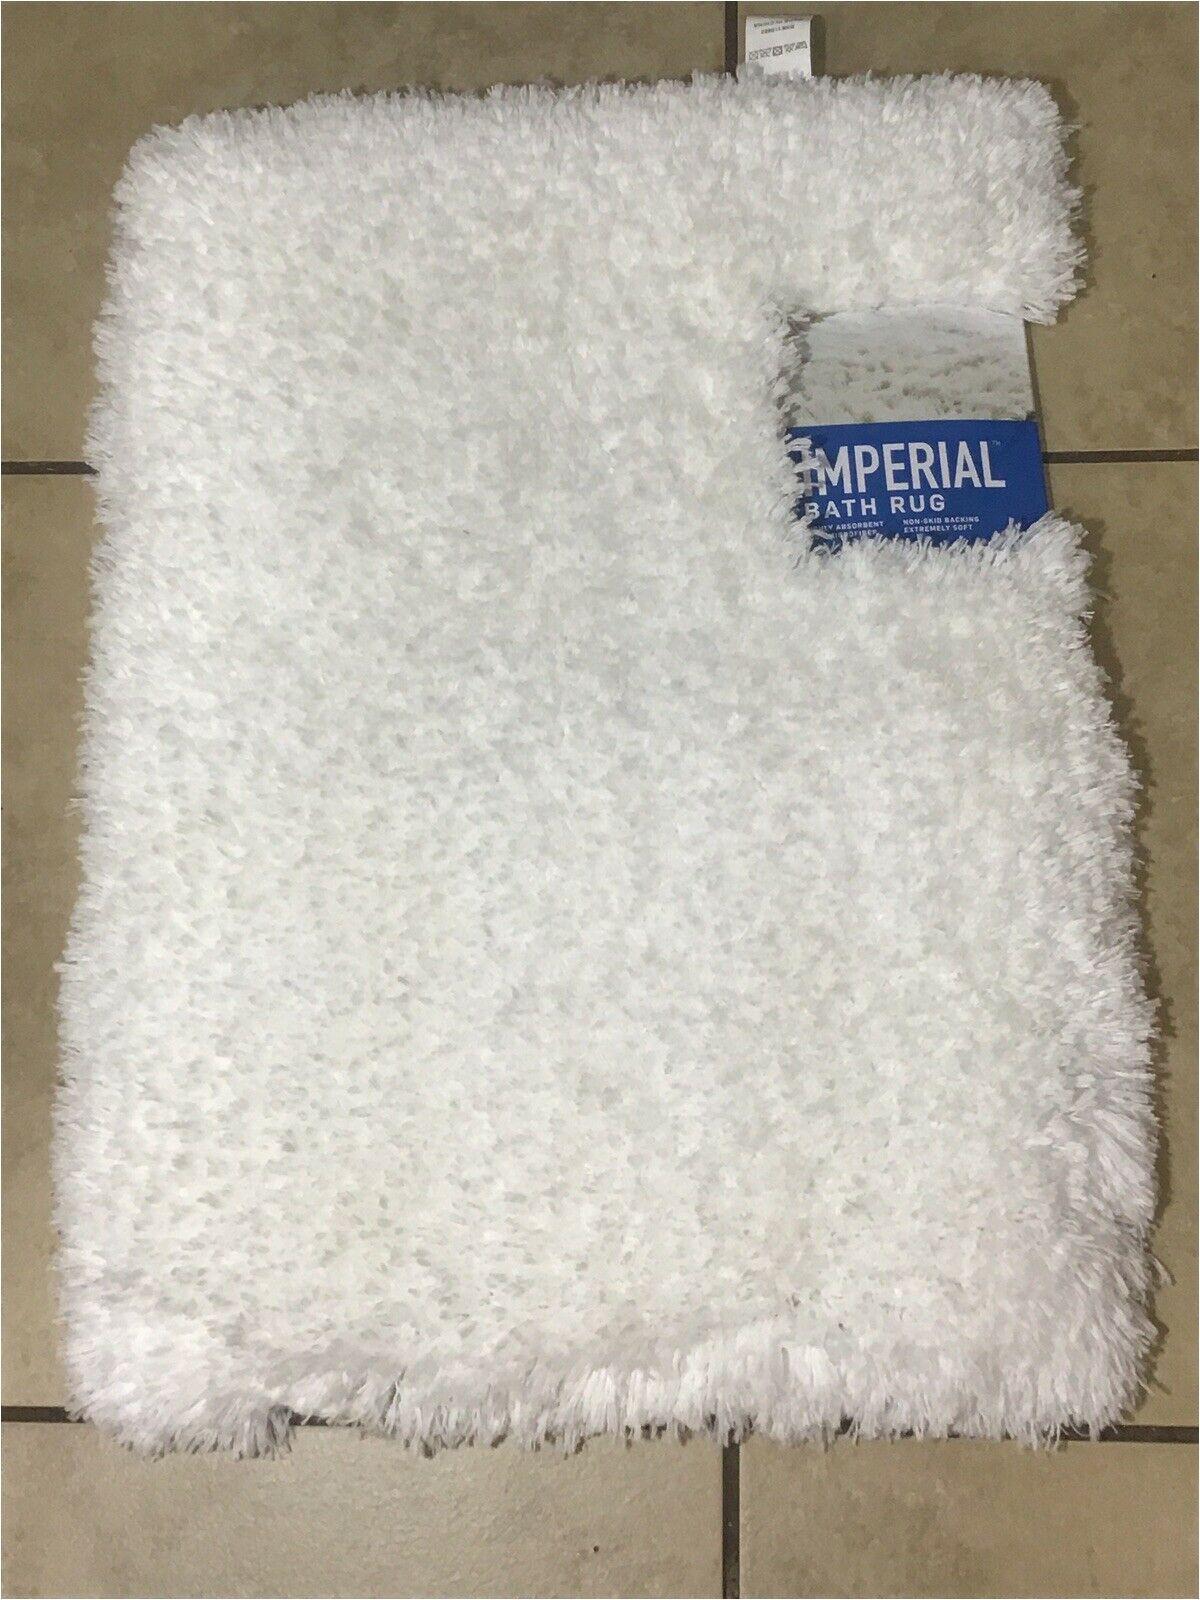 "Bath Rug 17 X 24 New White Imperial Super soft Bath Rug 17""x 24"" Non Skid Bathroom Design"